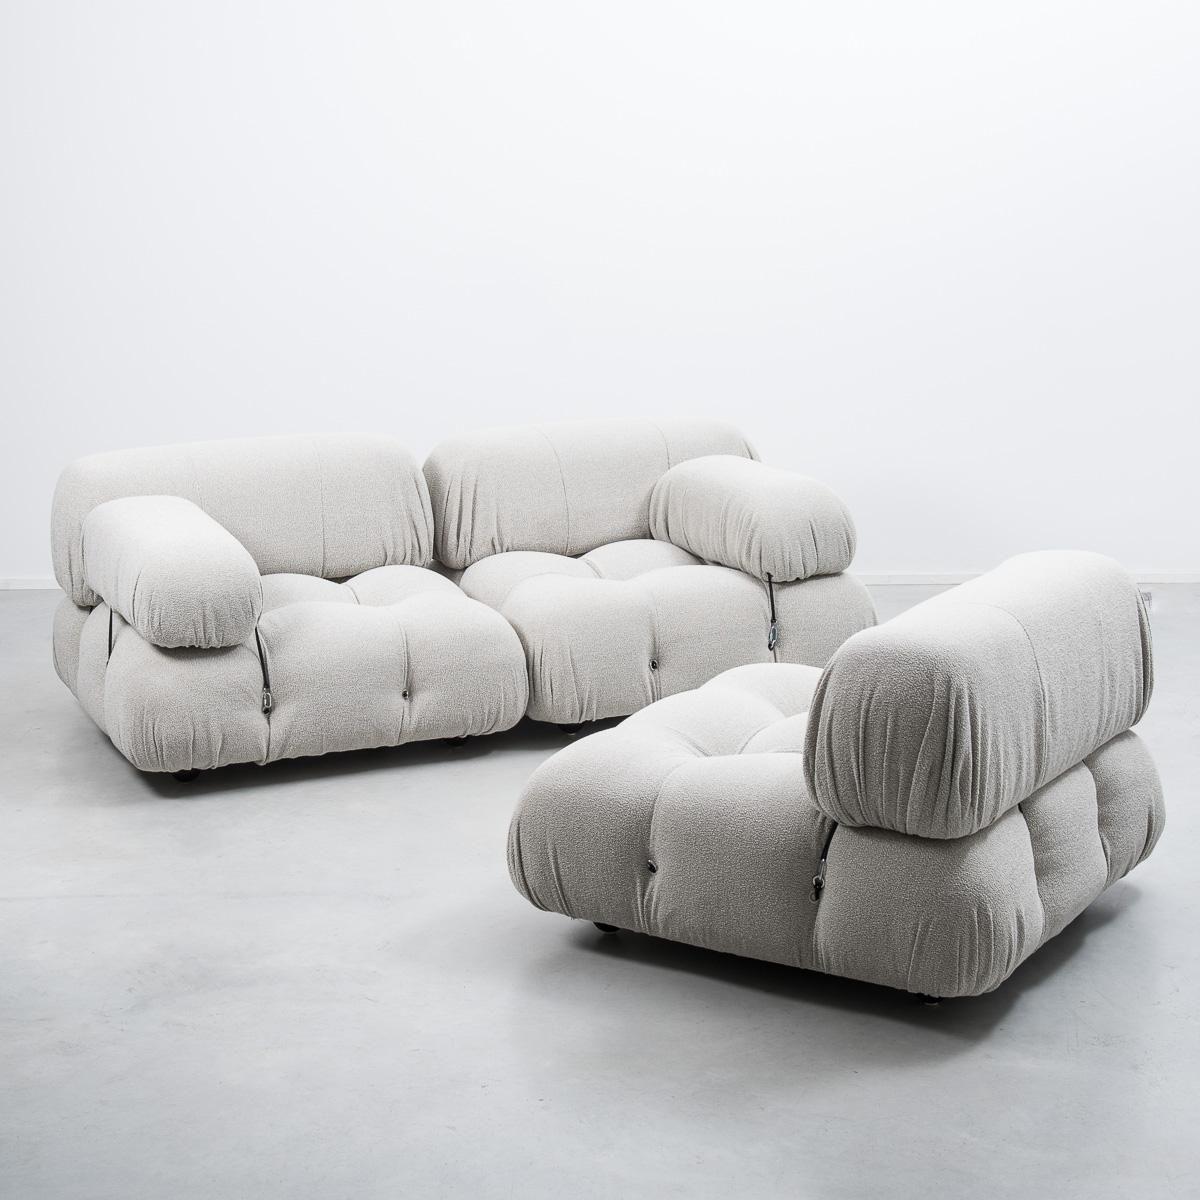 Camaleonda Three Seater Modular Sofa By Mario Bellini For B Italia 1970s